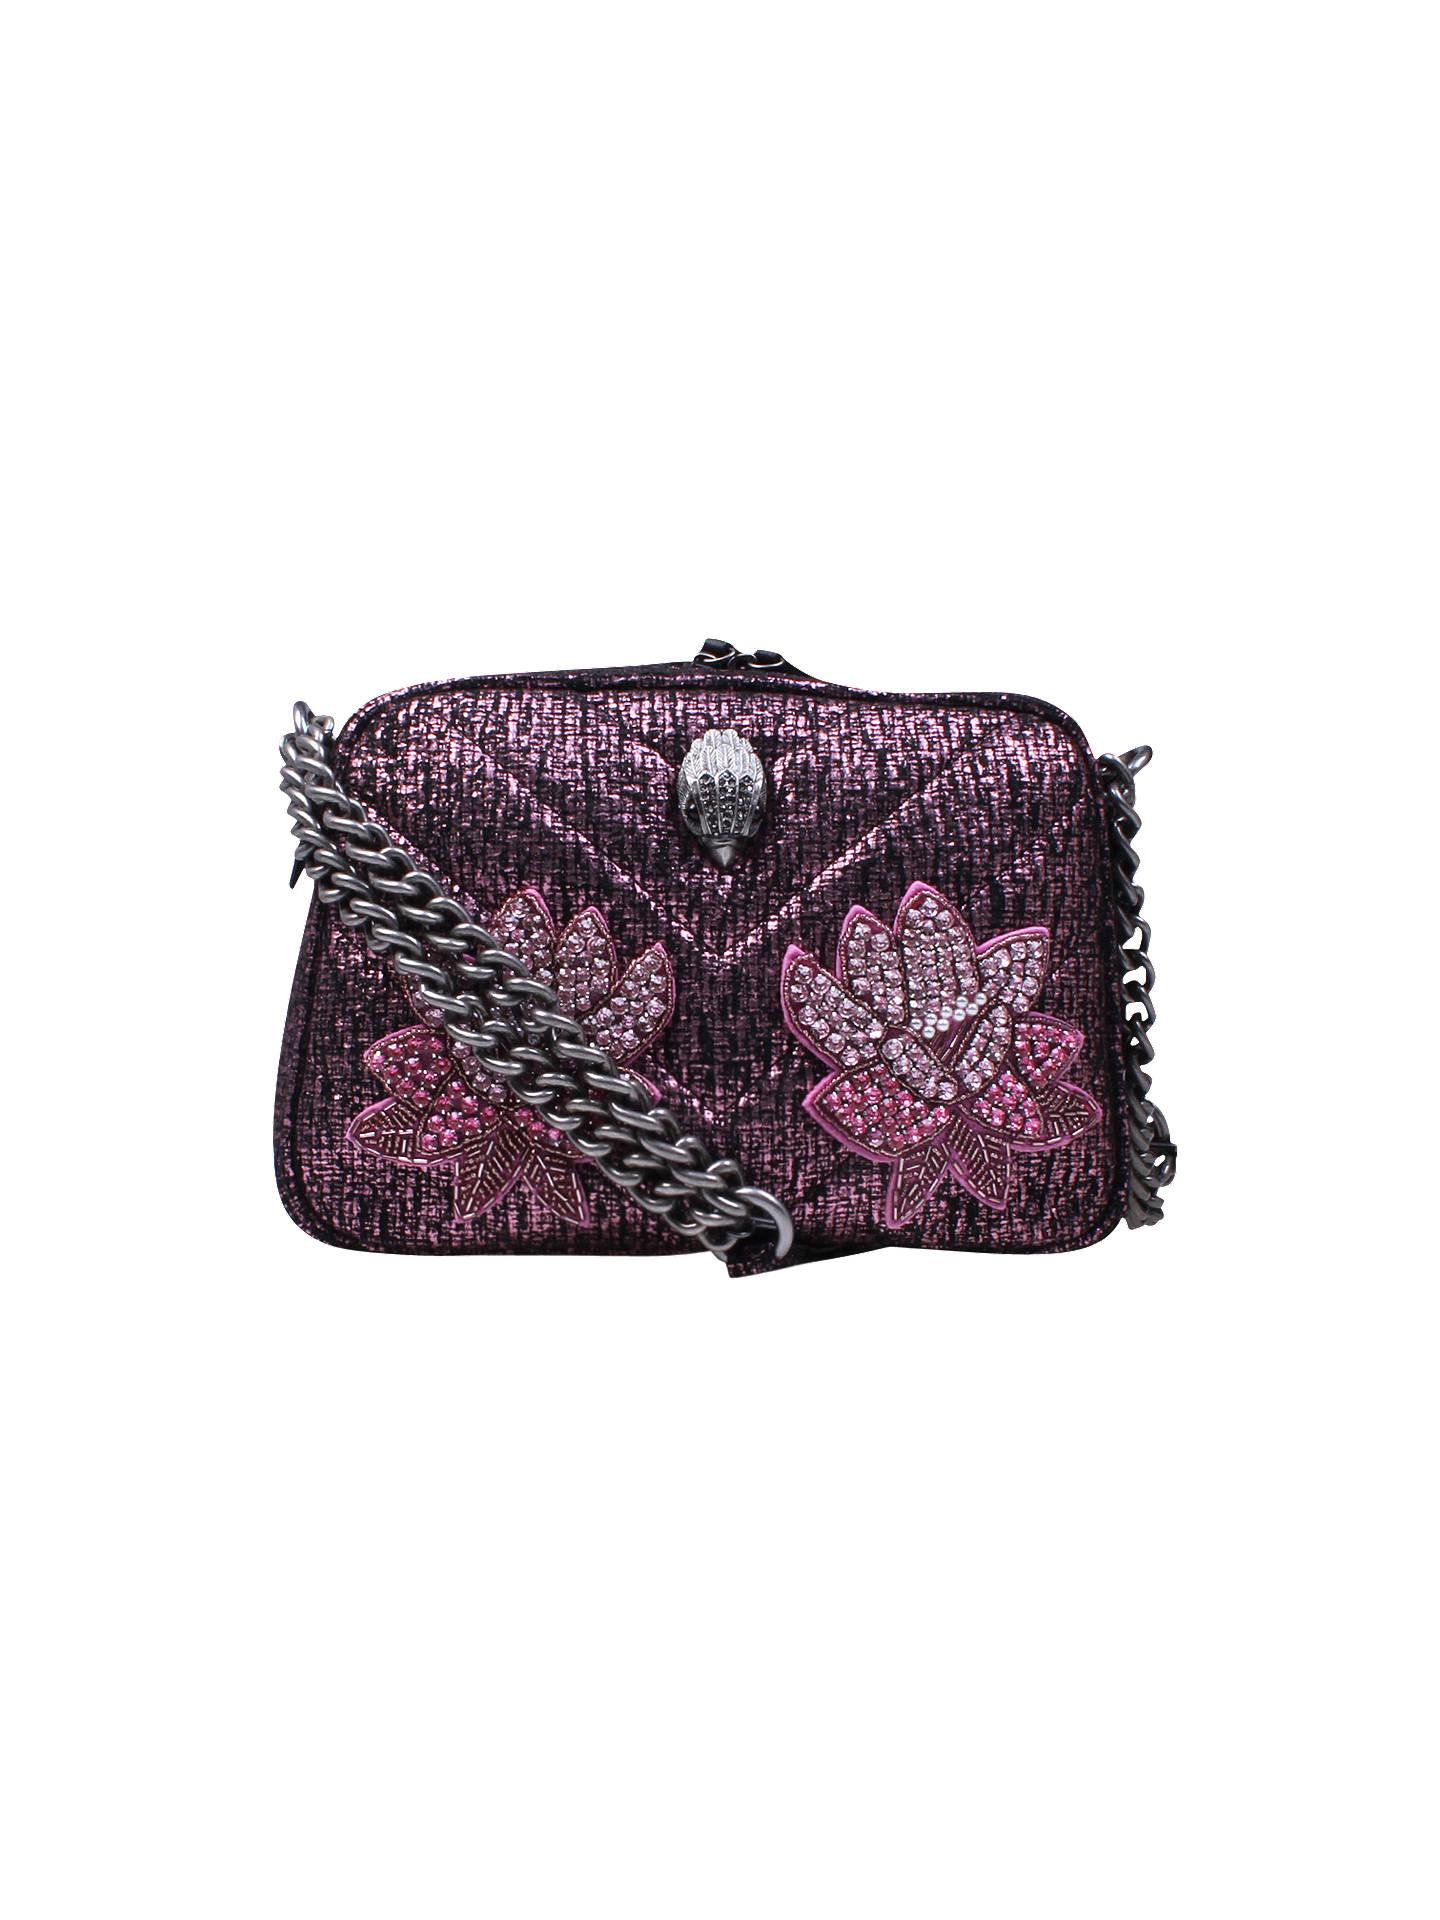 bfad940d7f65 Buy Kurt Geiger Tweed Plum Cross Body Bag